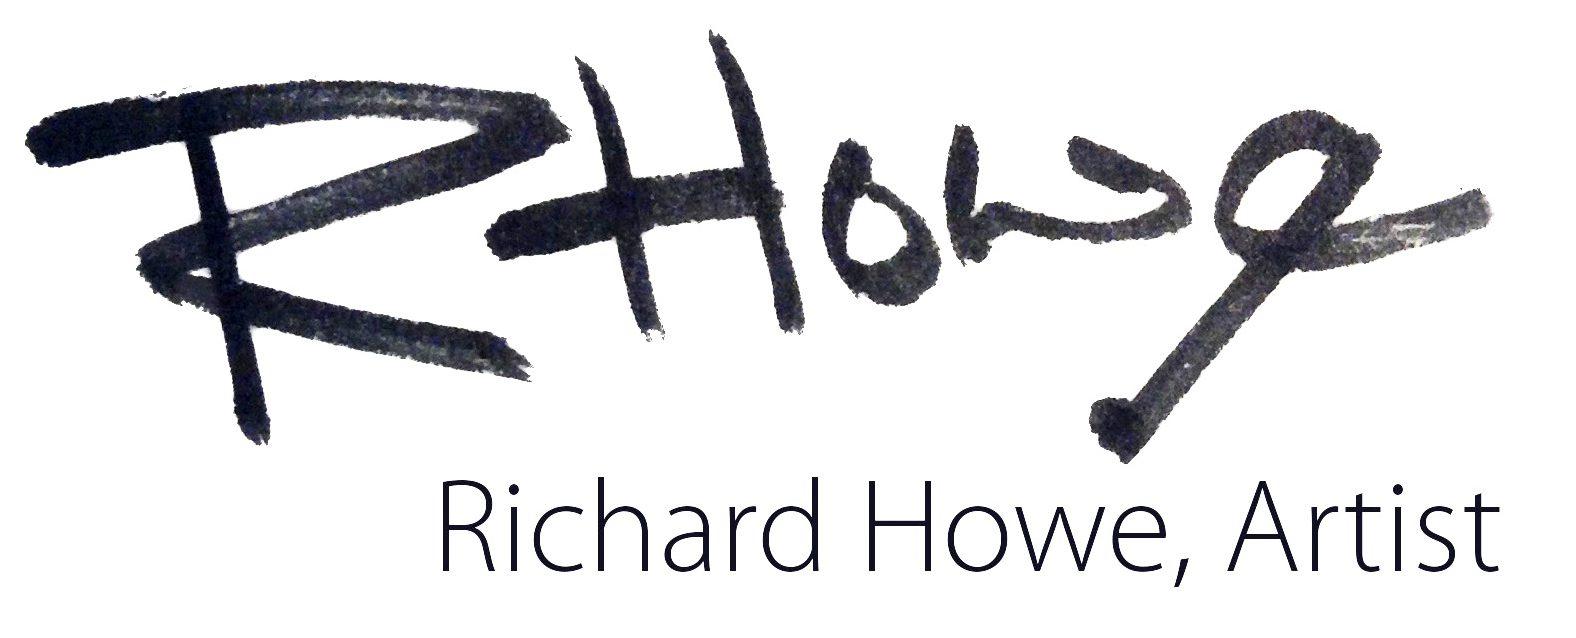 Richard Howe – Artist